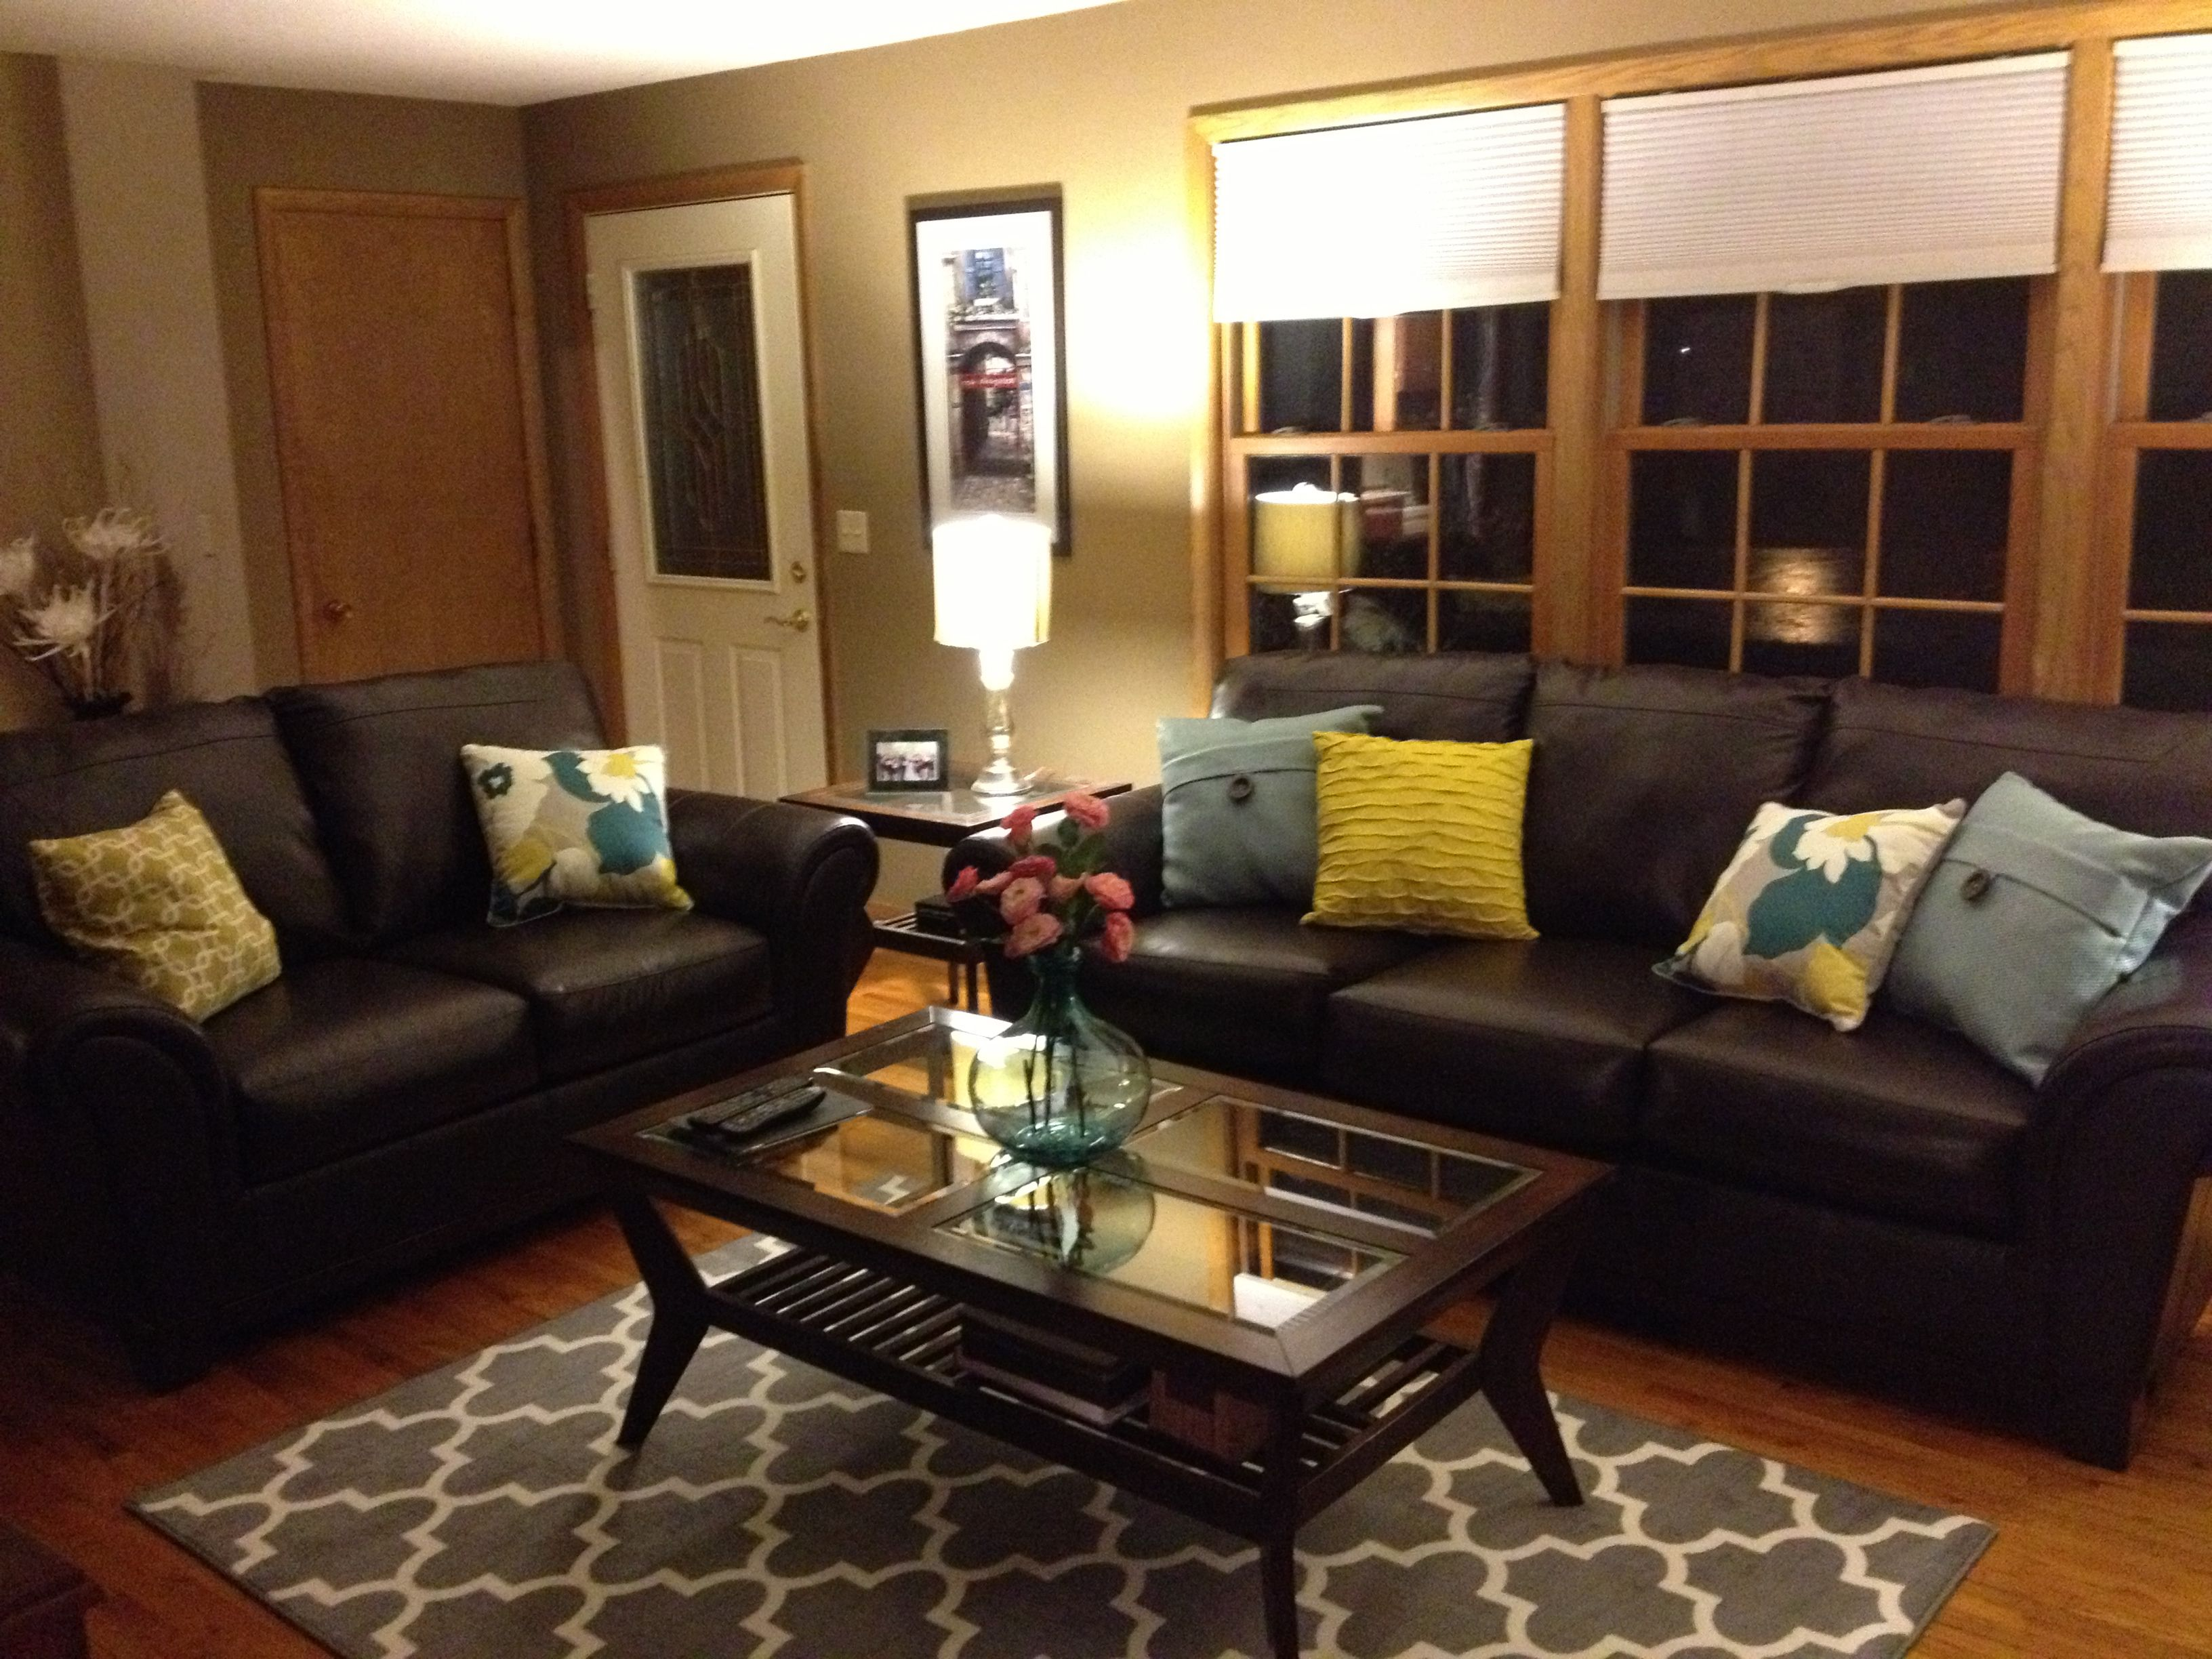 Pin By Tasha Carlson On Home Decor Brown Sofa Living Room Brown